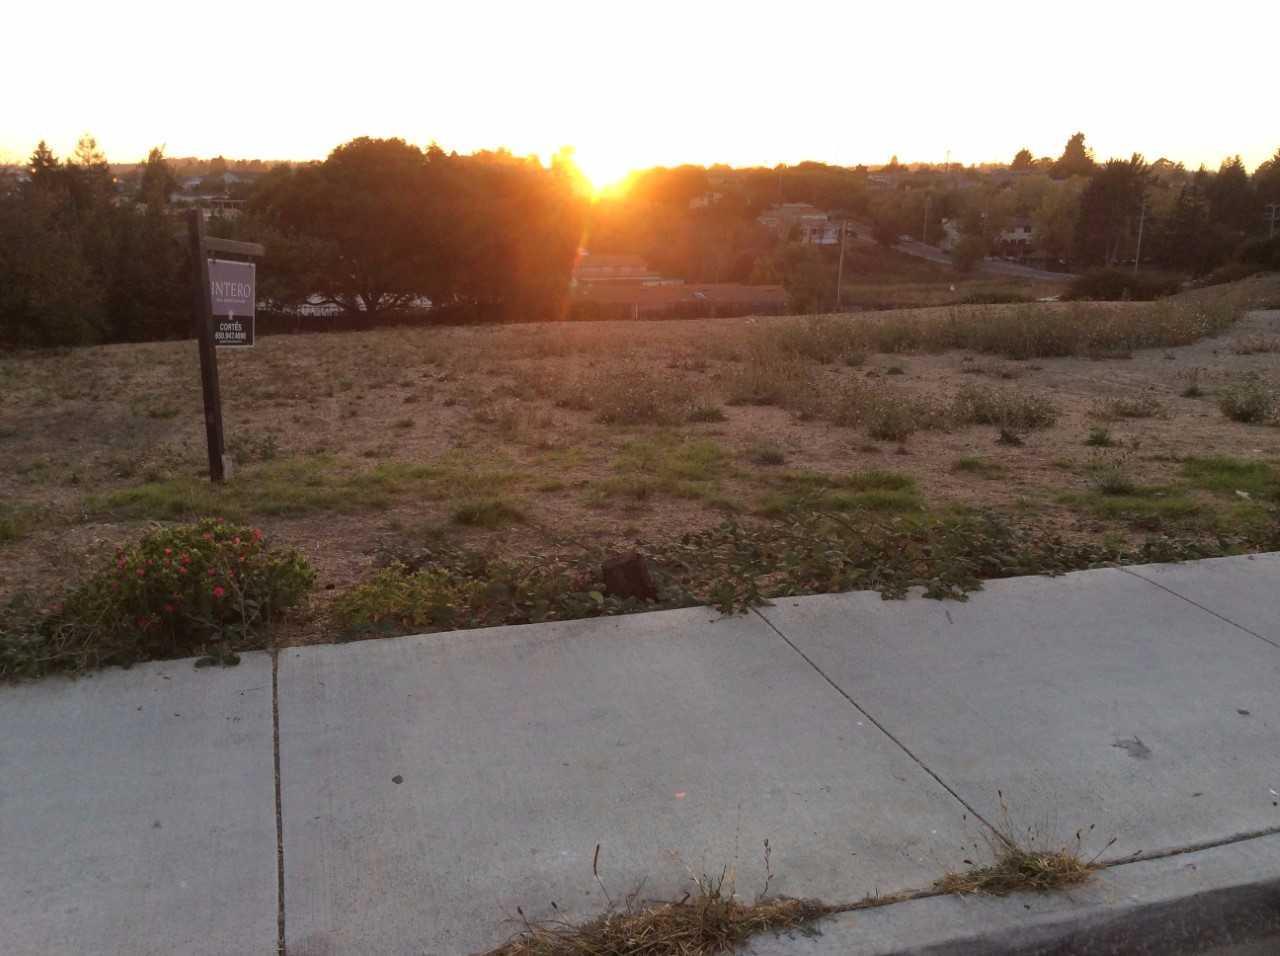 1031 Freedom Boulevard Watsonville, CA 95076 - MLS #: ML81686589